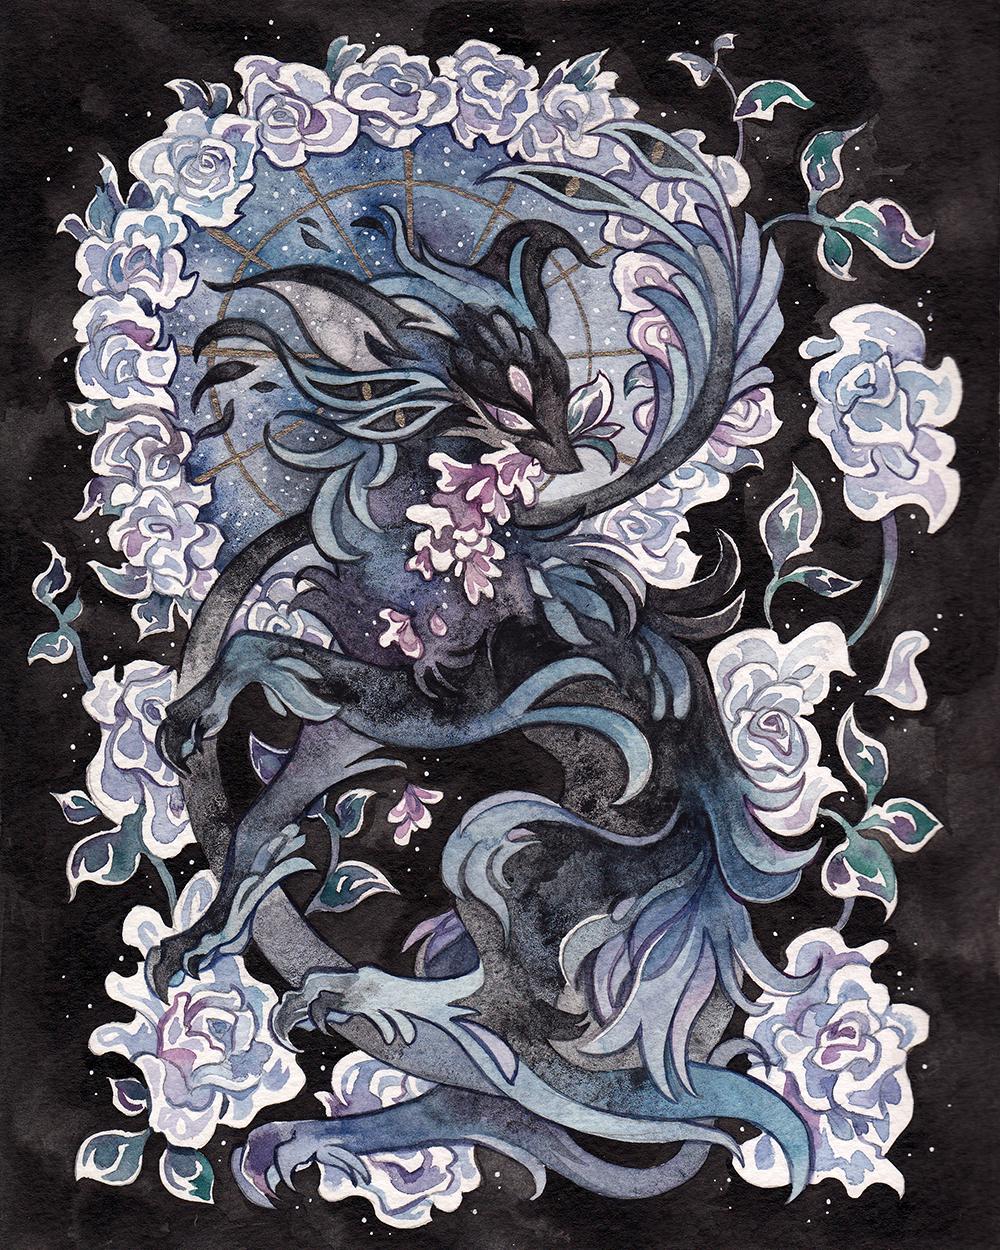 """ Cosmic Aroma"" by Emily Smith"